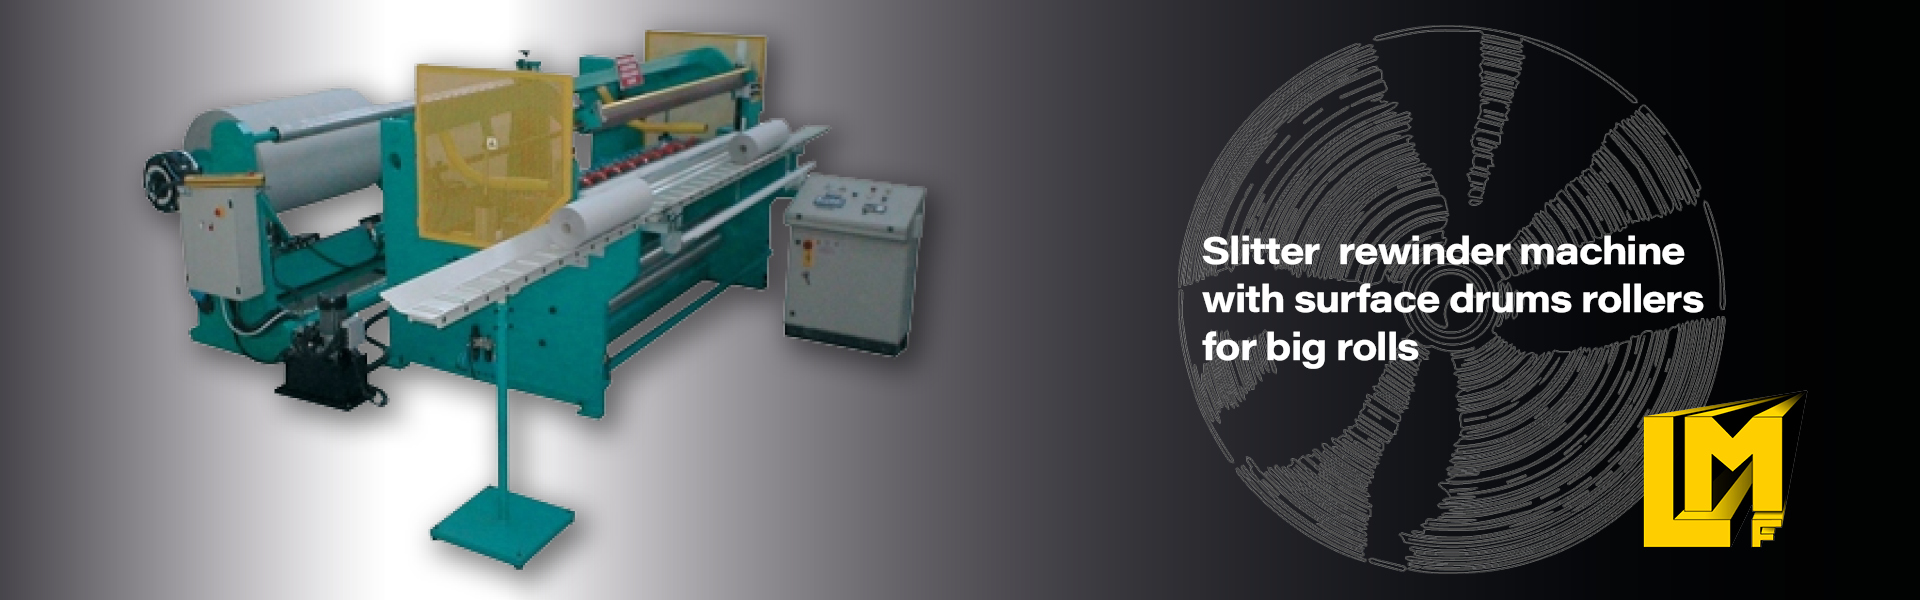 Slitter rewinder machine for paper plotter rolls and vinyls